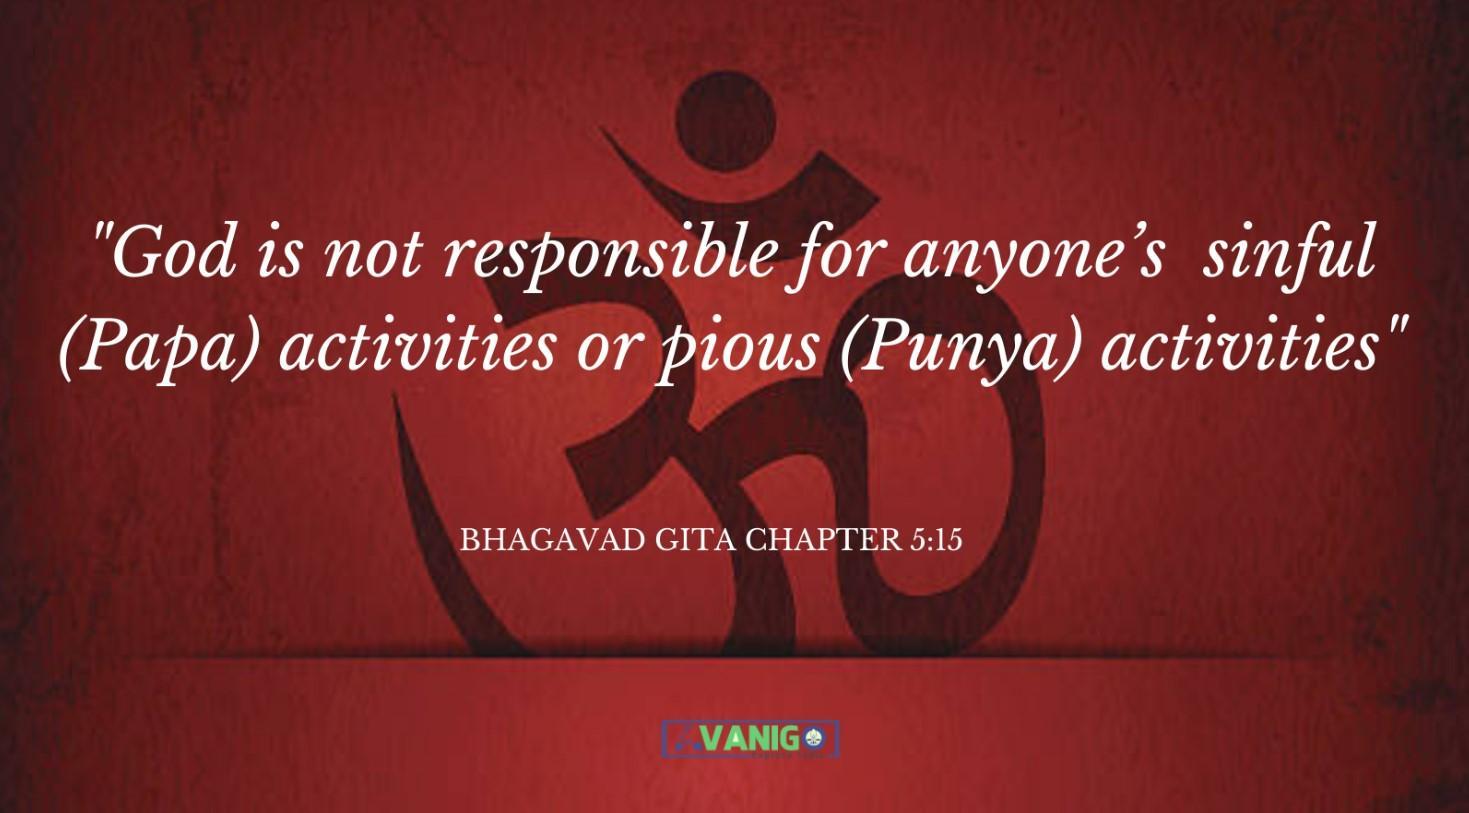 Bhagvad Gita Chapter 5:15